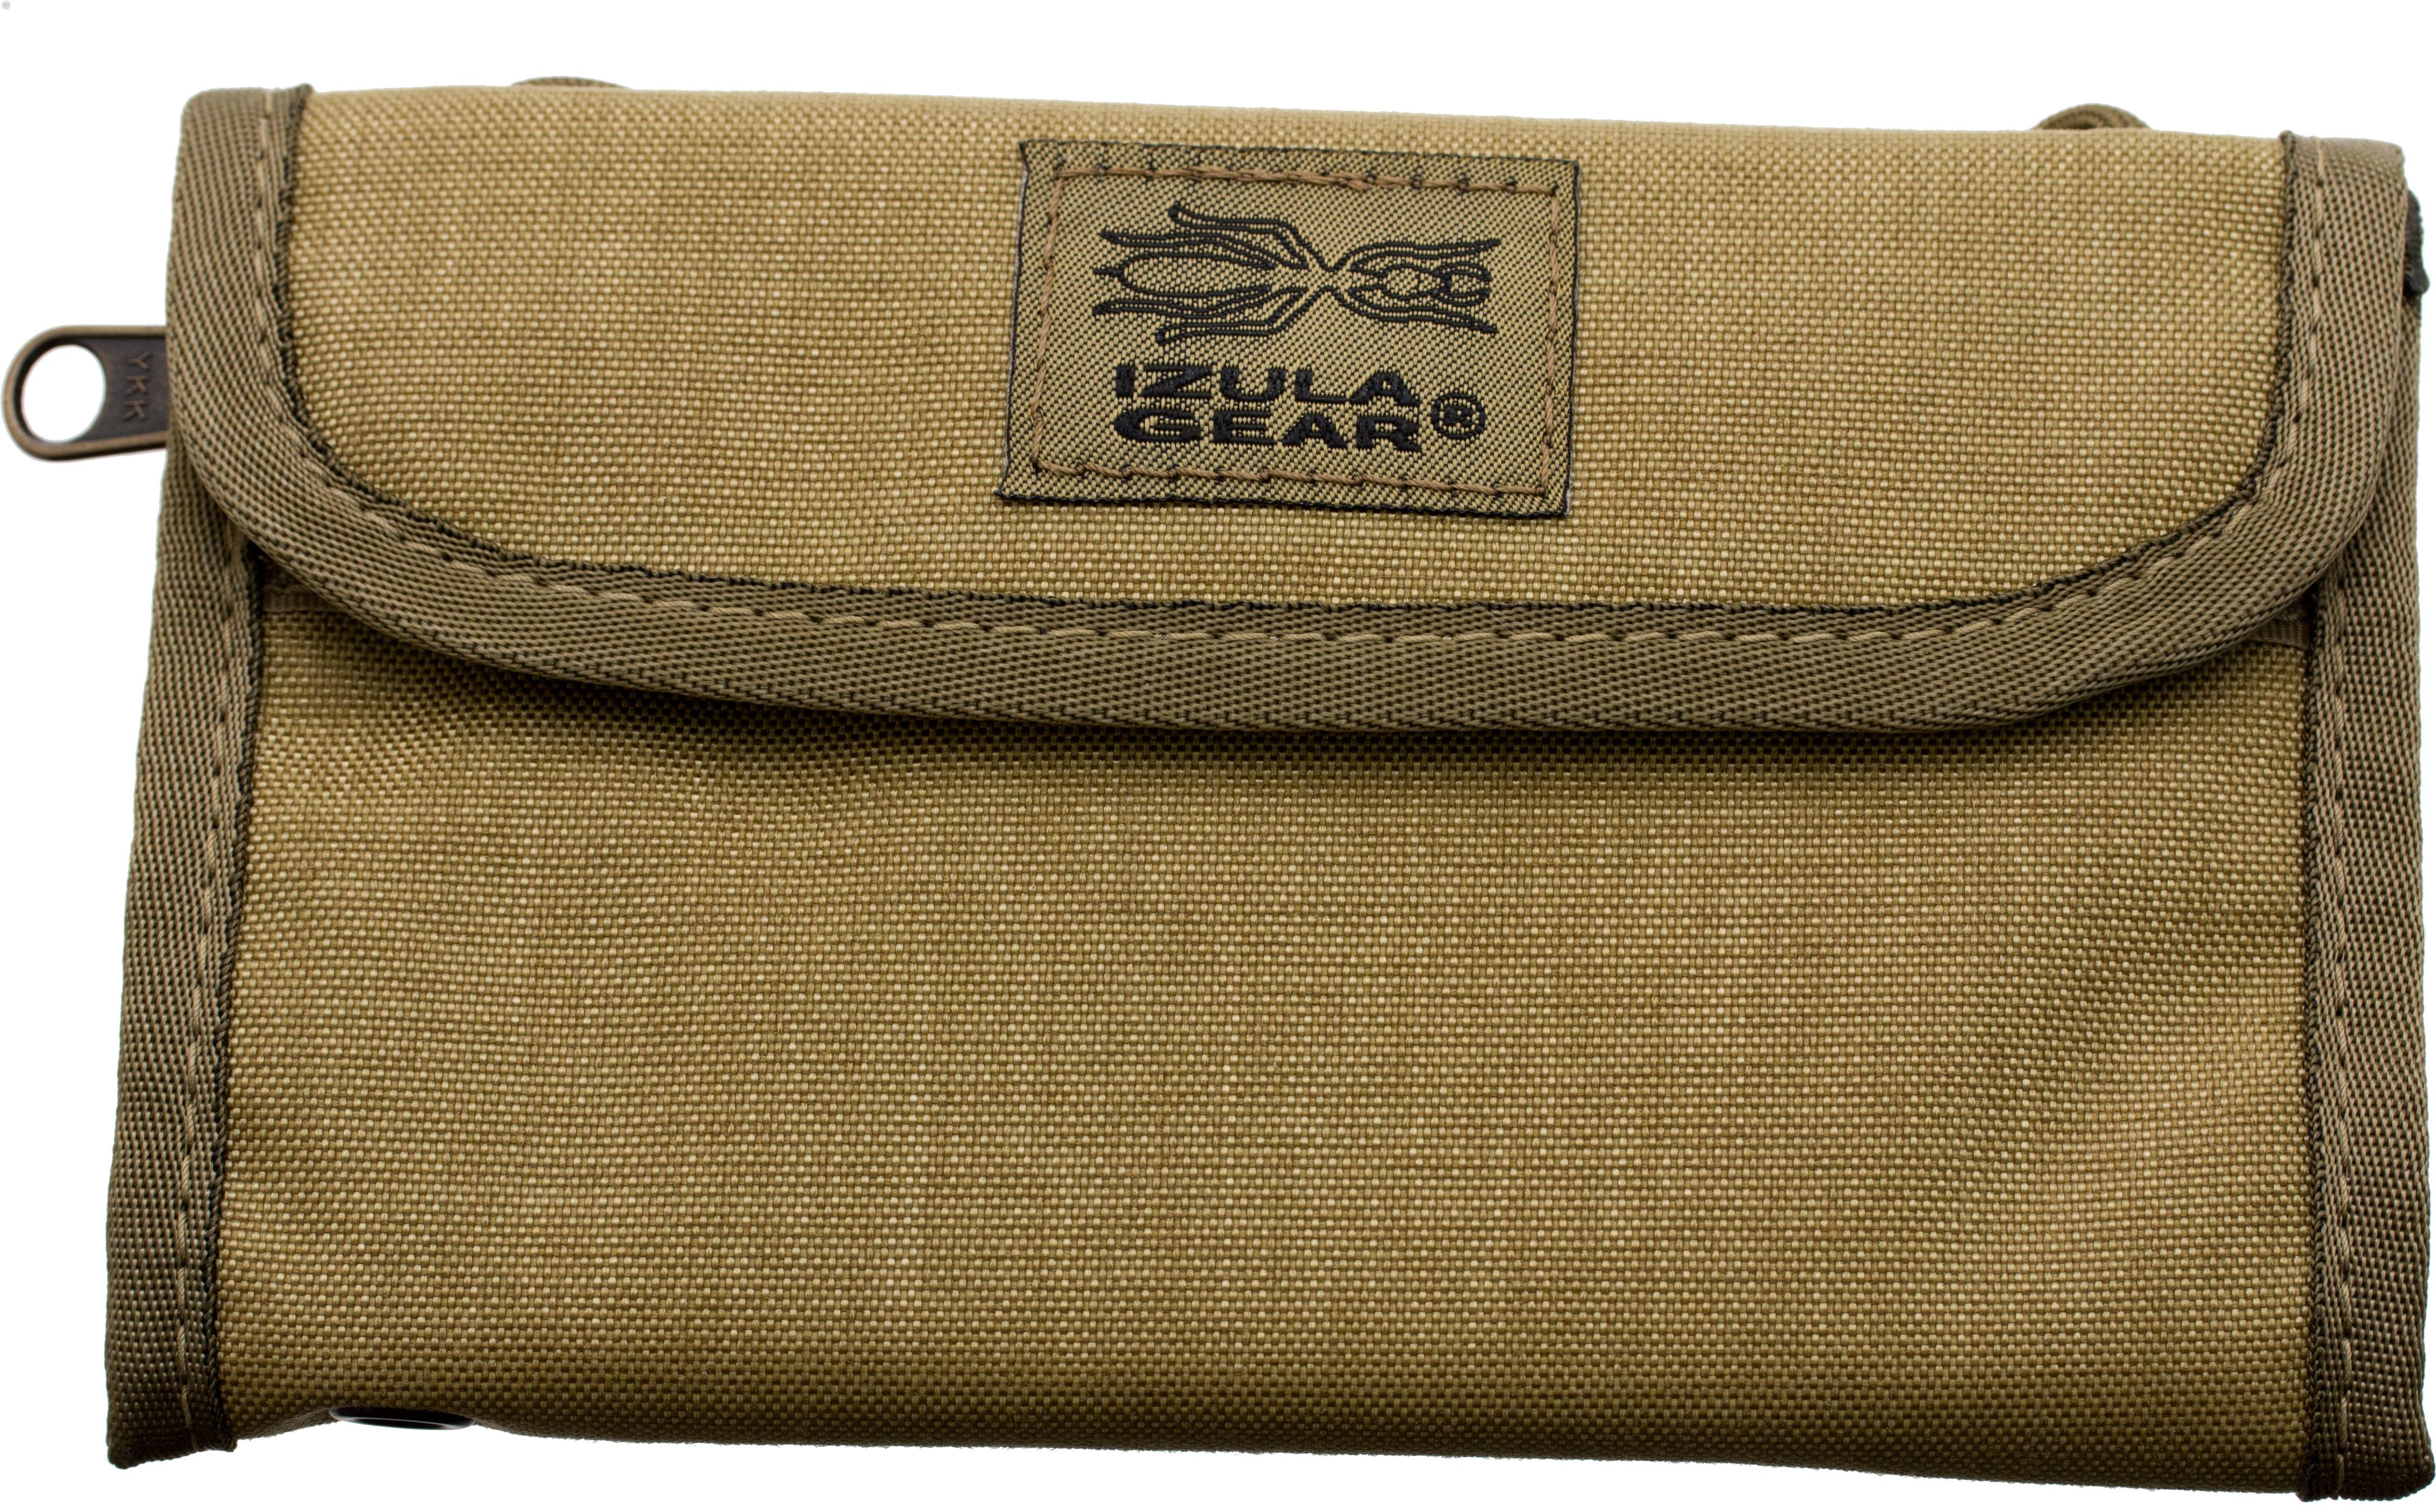 ESEE Izula Gear Passport Case with Bullet Space Pen, Desert Tan